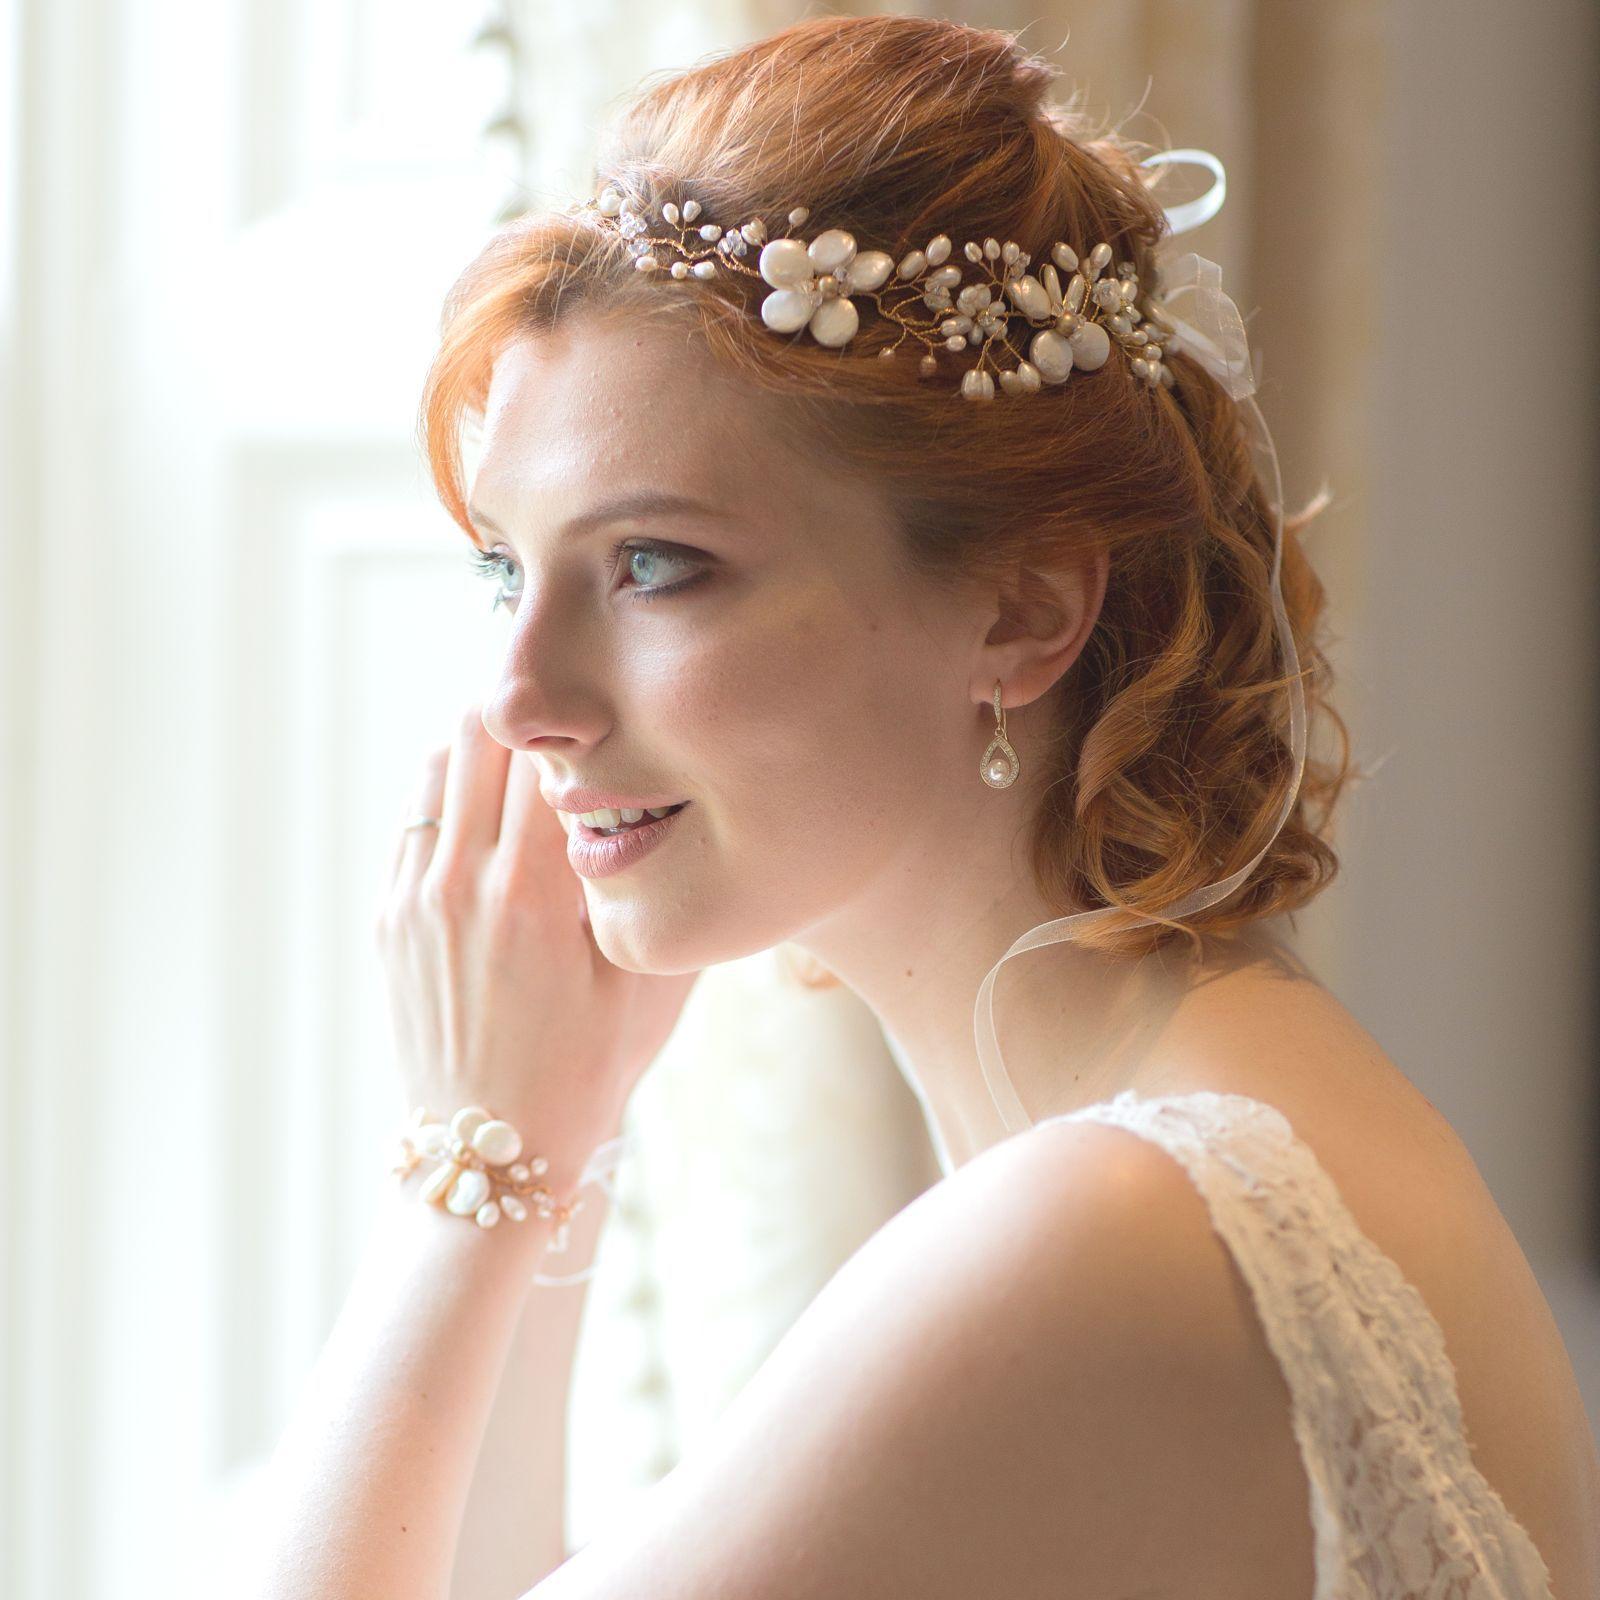 bridal hair vine stardust is a delicately interwoven hair vine